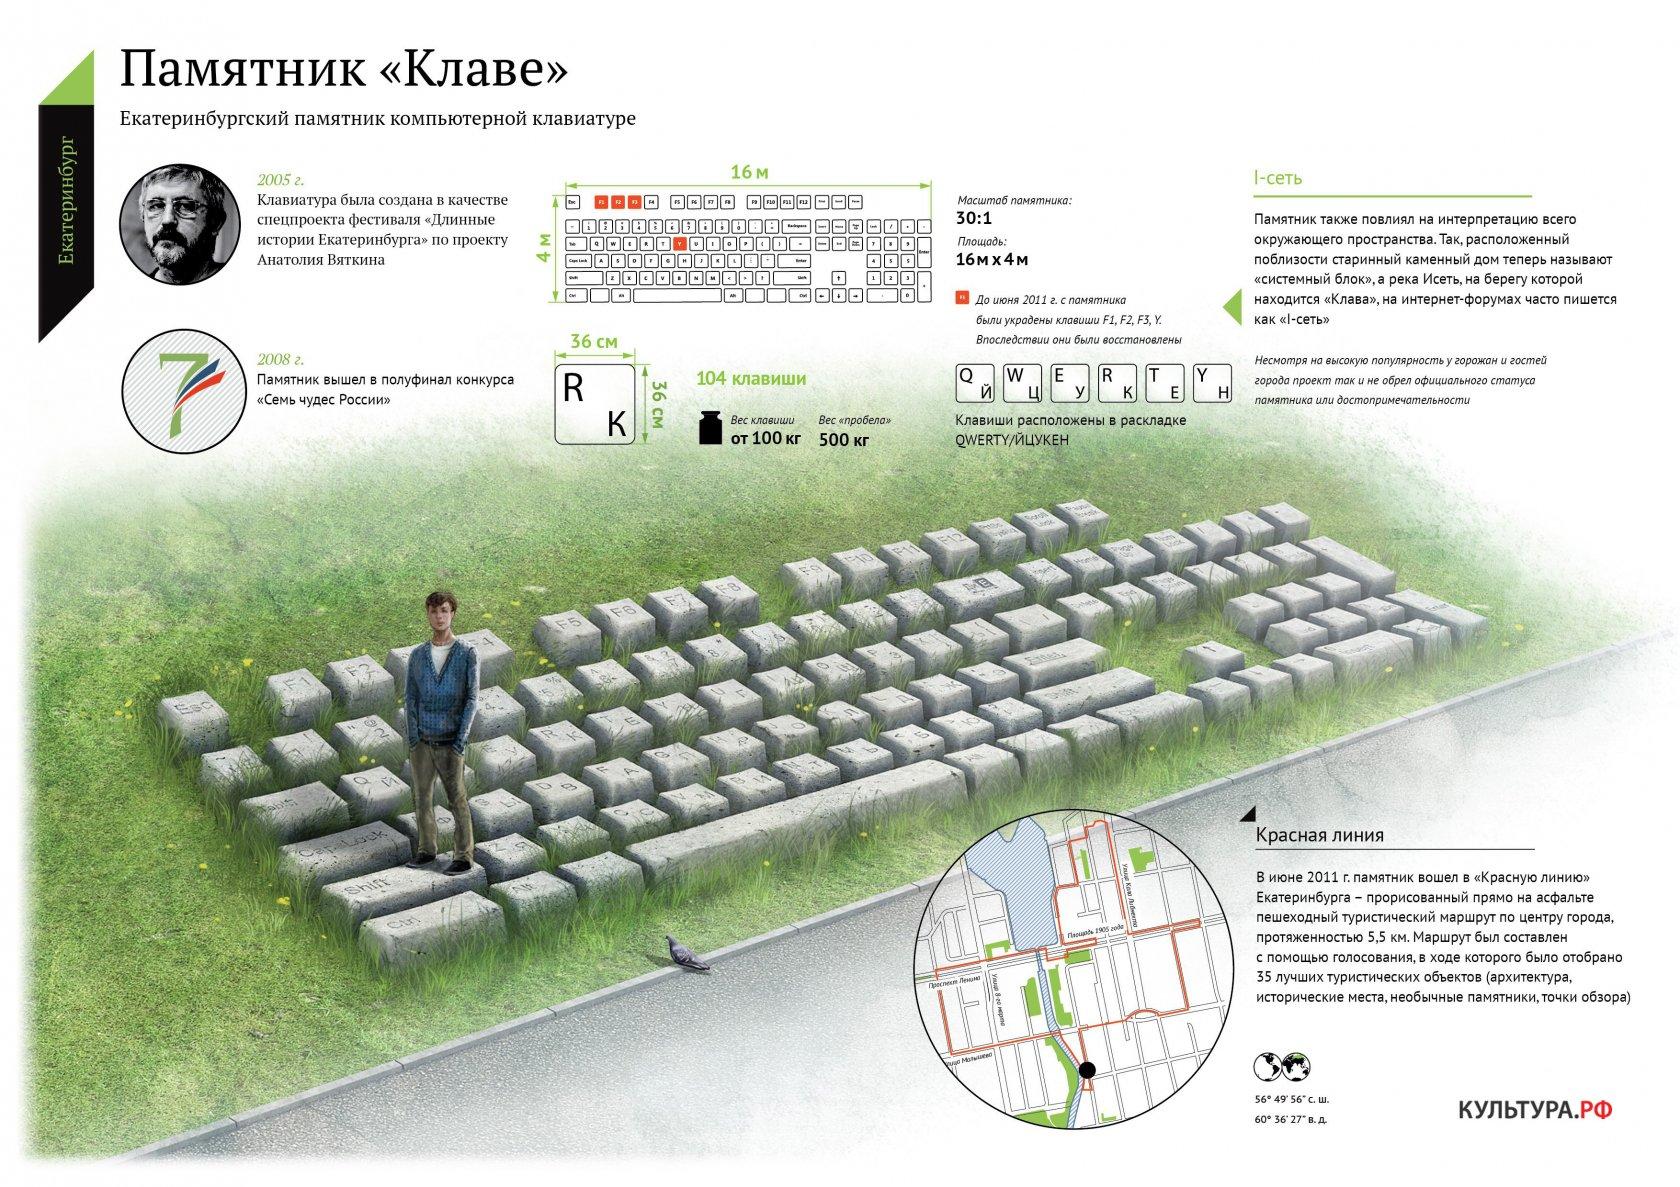 Инфографика: памятник клавиатуре